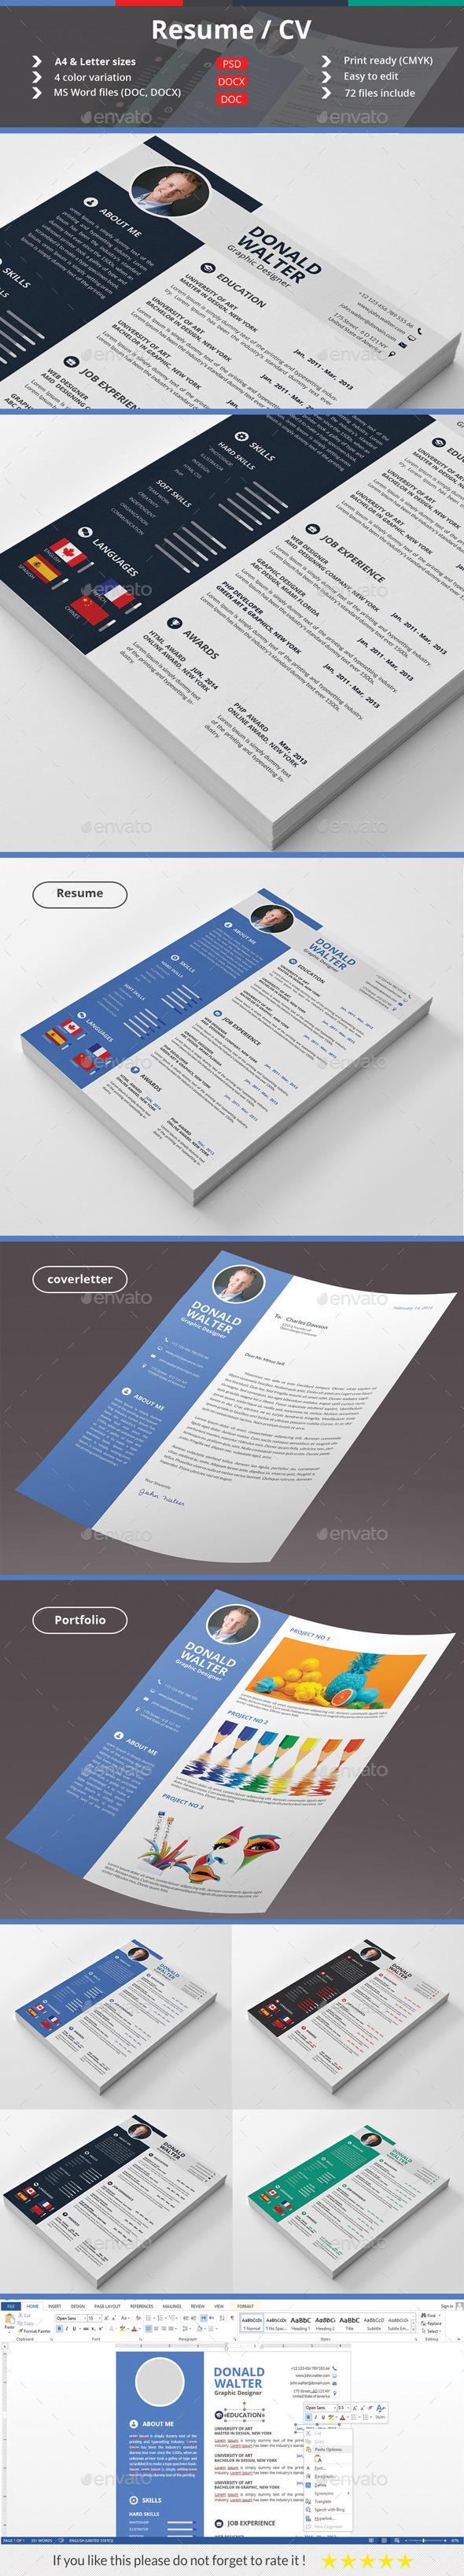 Resume / CV